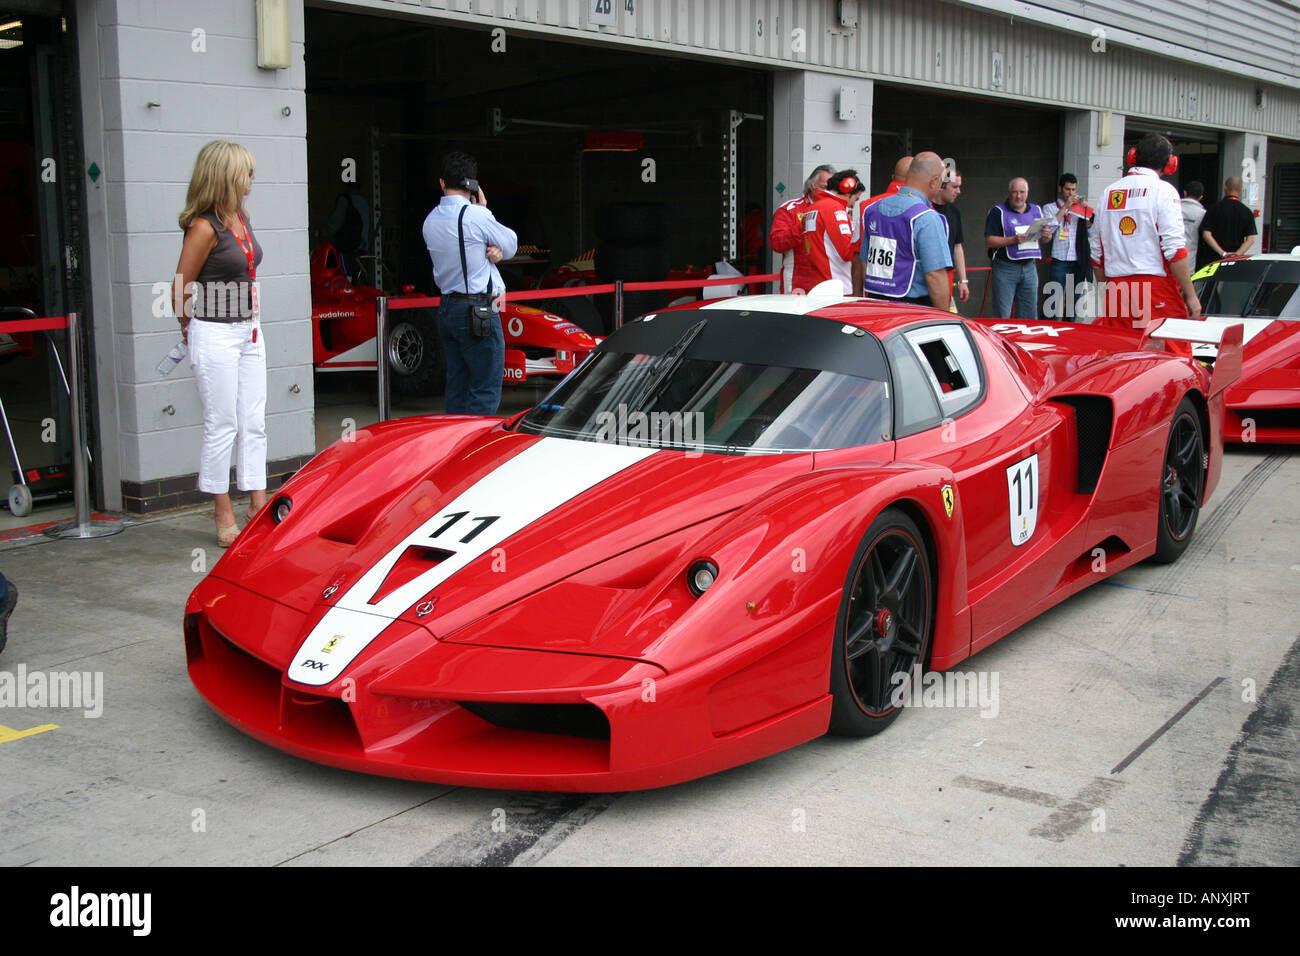 ferrari ferrari FXX silverstone italian italy sportscar super car Stock Photo, Royalty Free